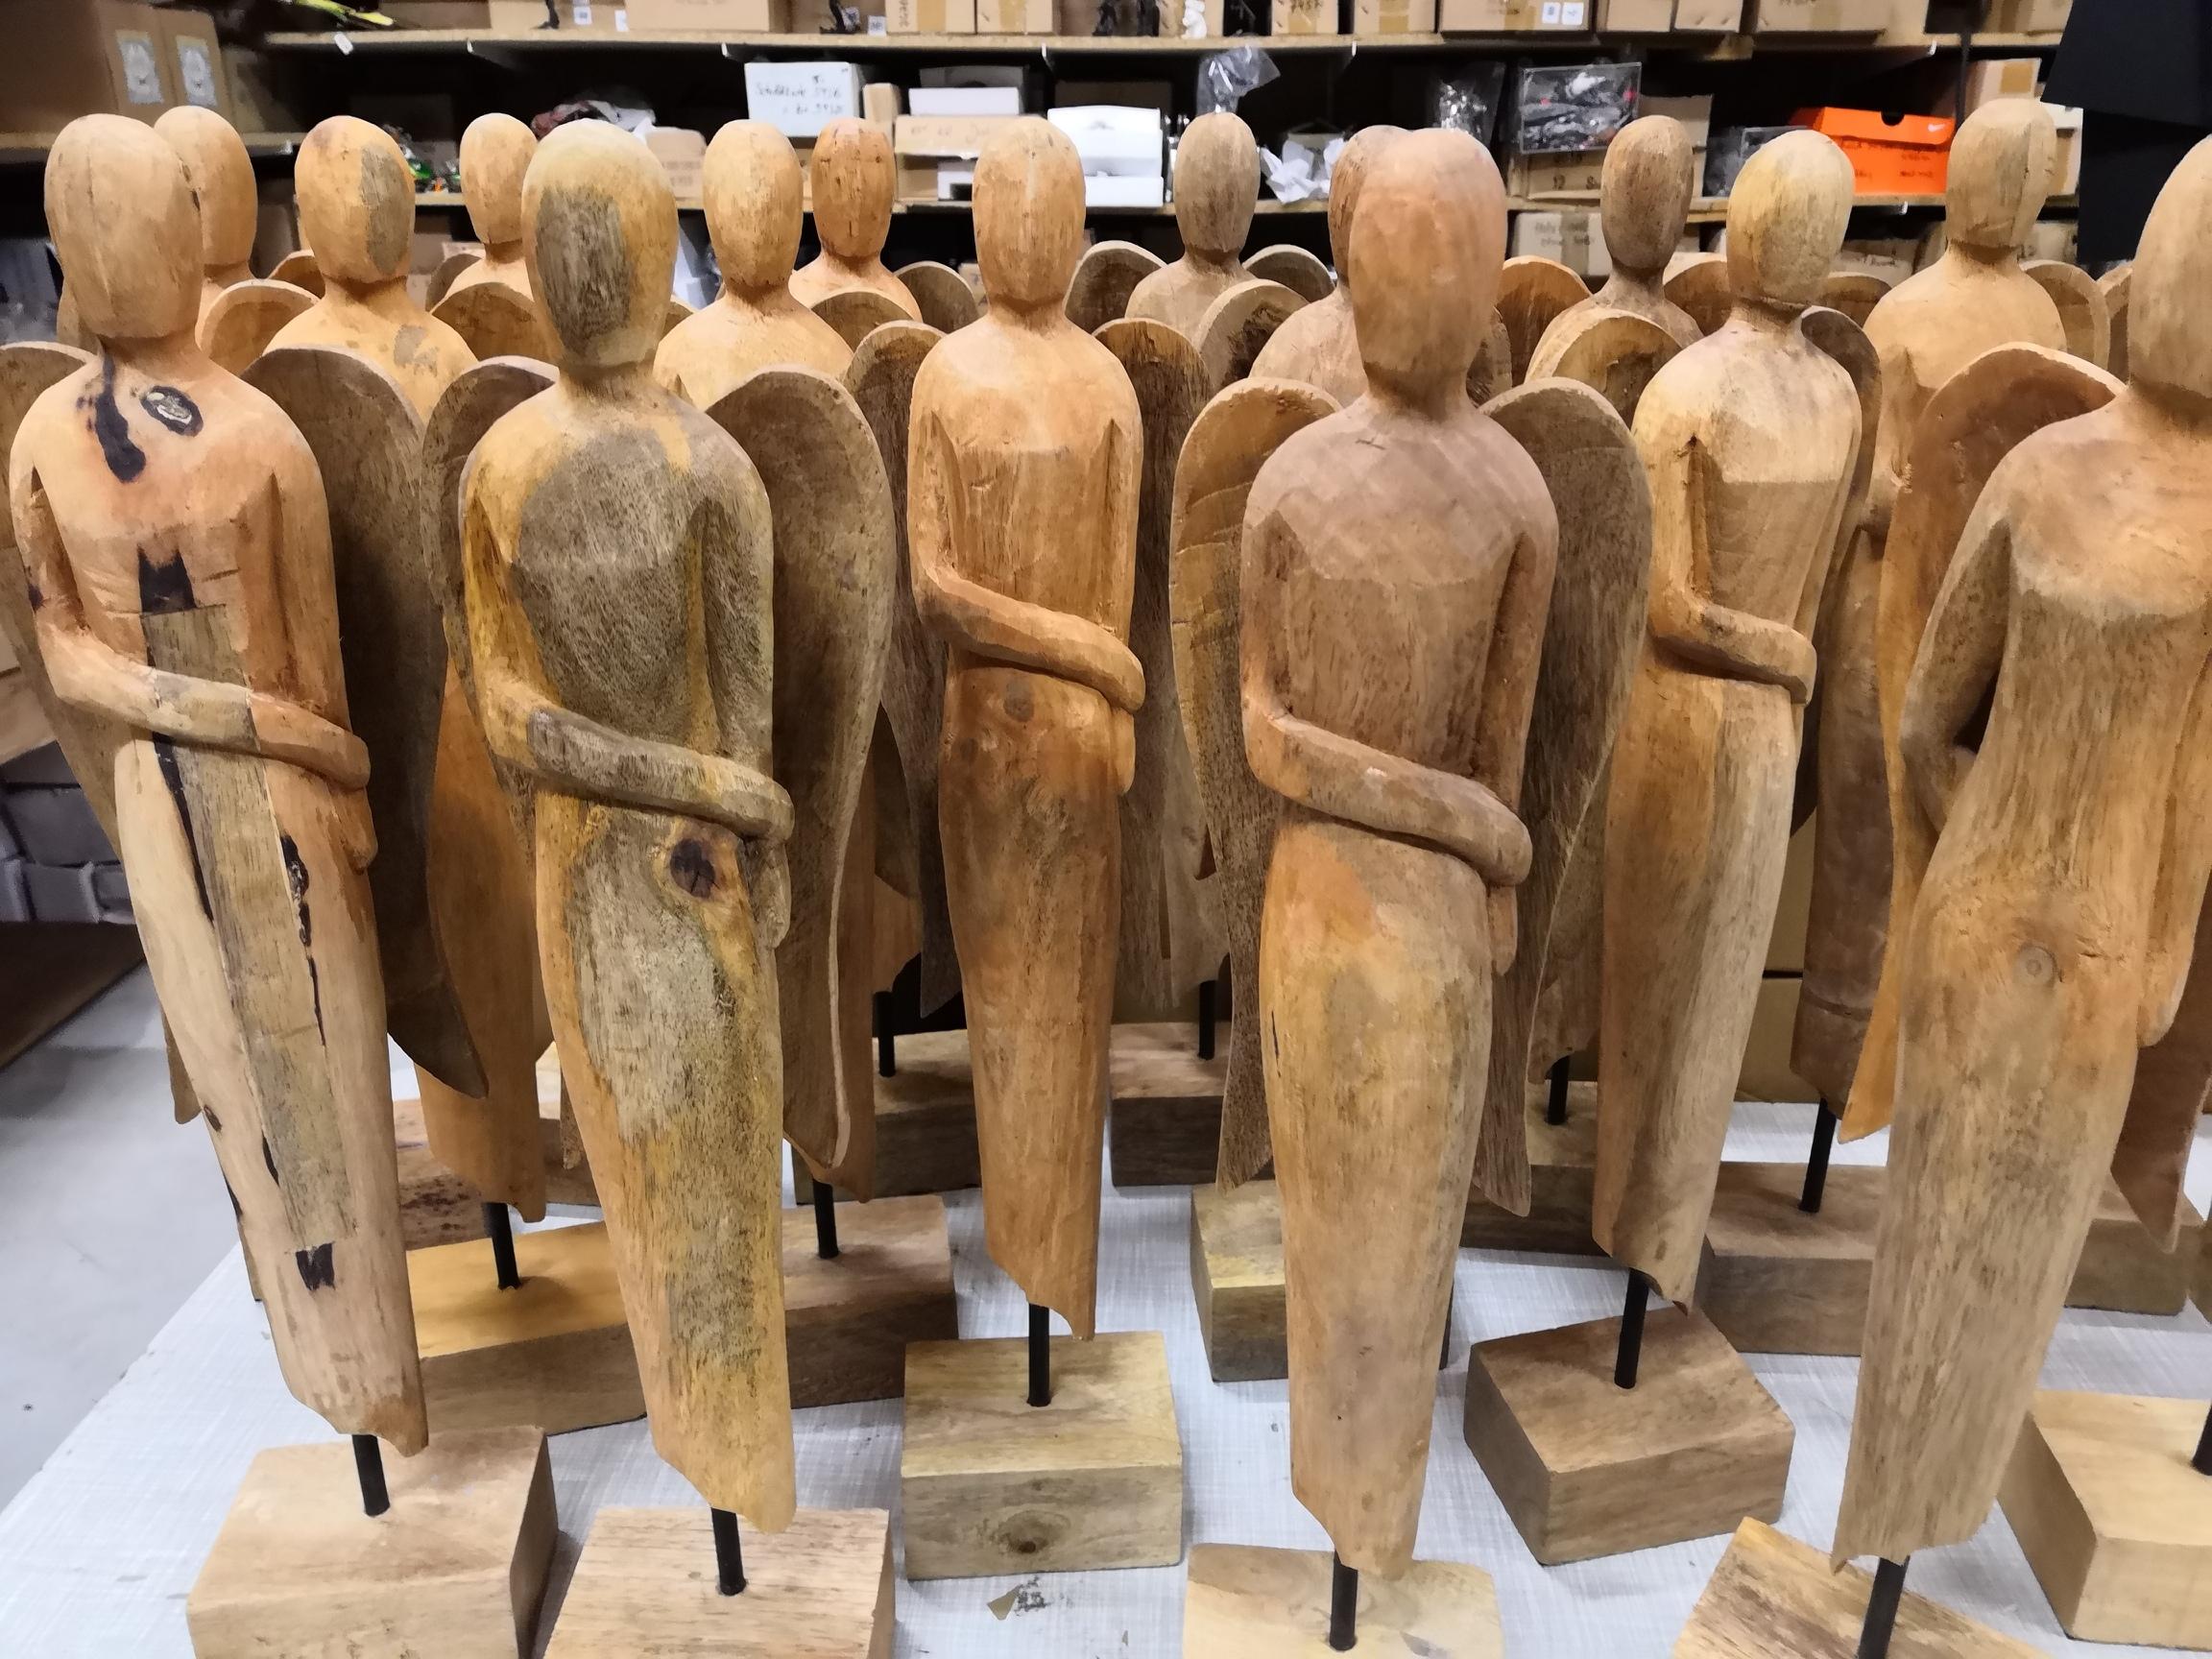 Holz Engel Skulptur Artisanal 51cm Moderne Plastik Dekofigur